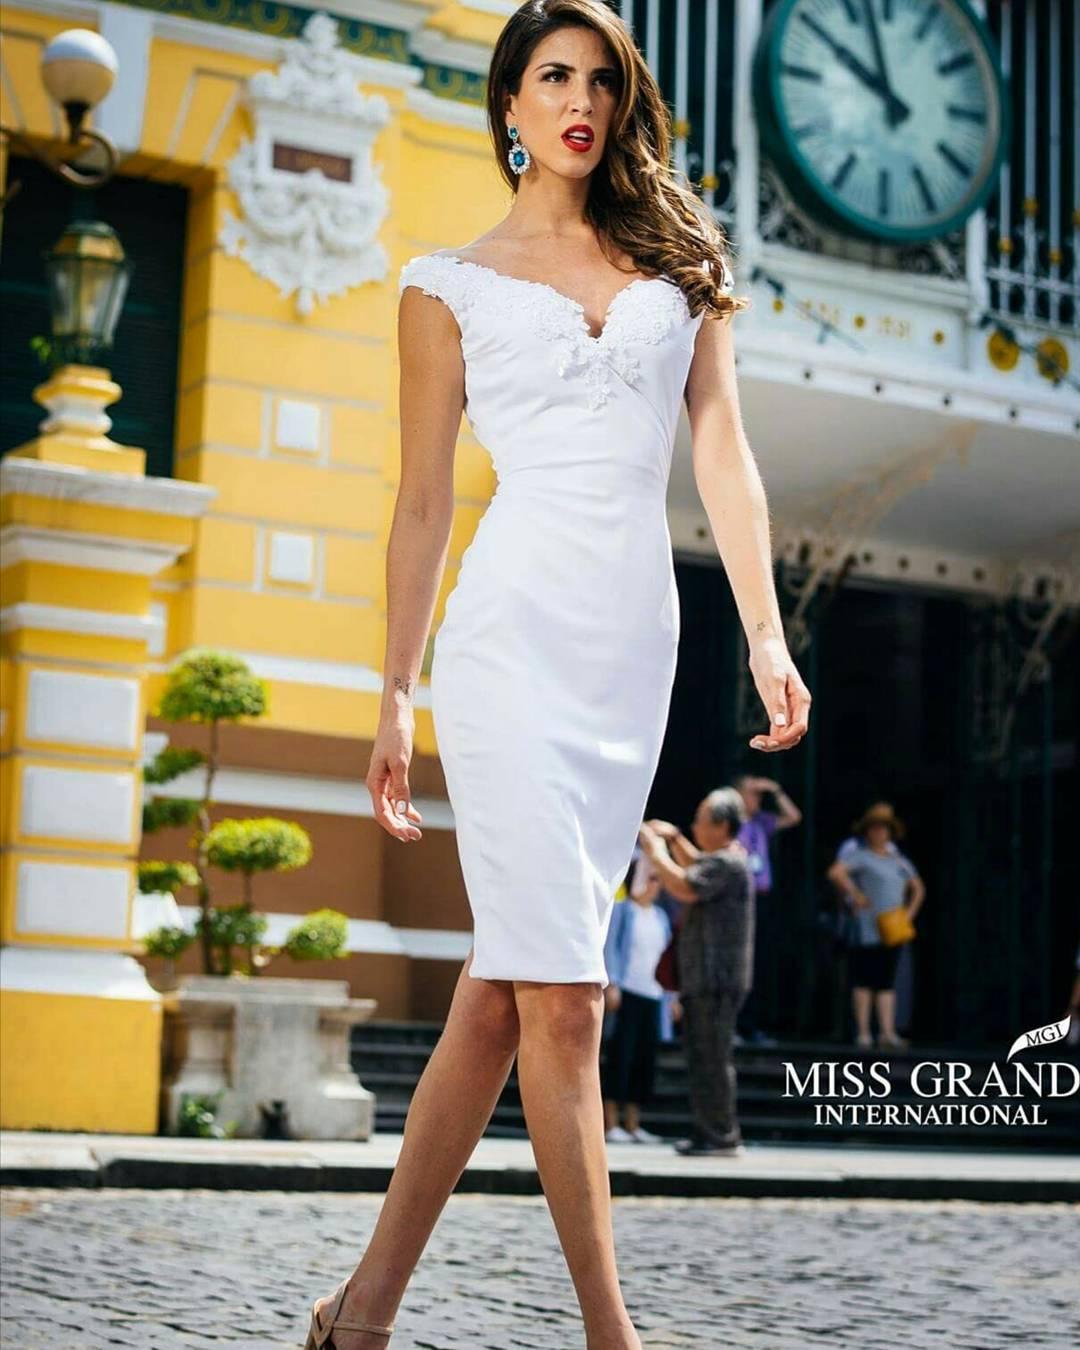 maria jose lora, miss grand international 2017. - Página 6 22351714